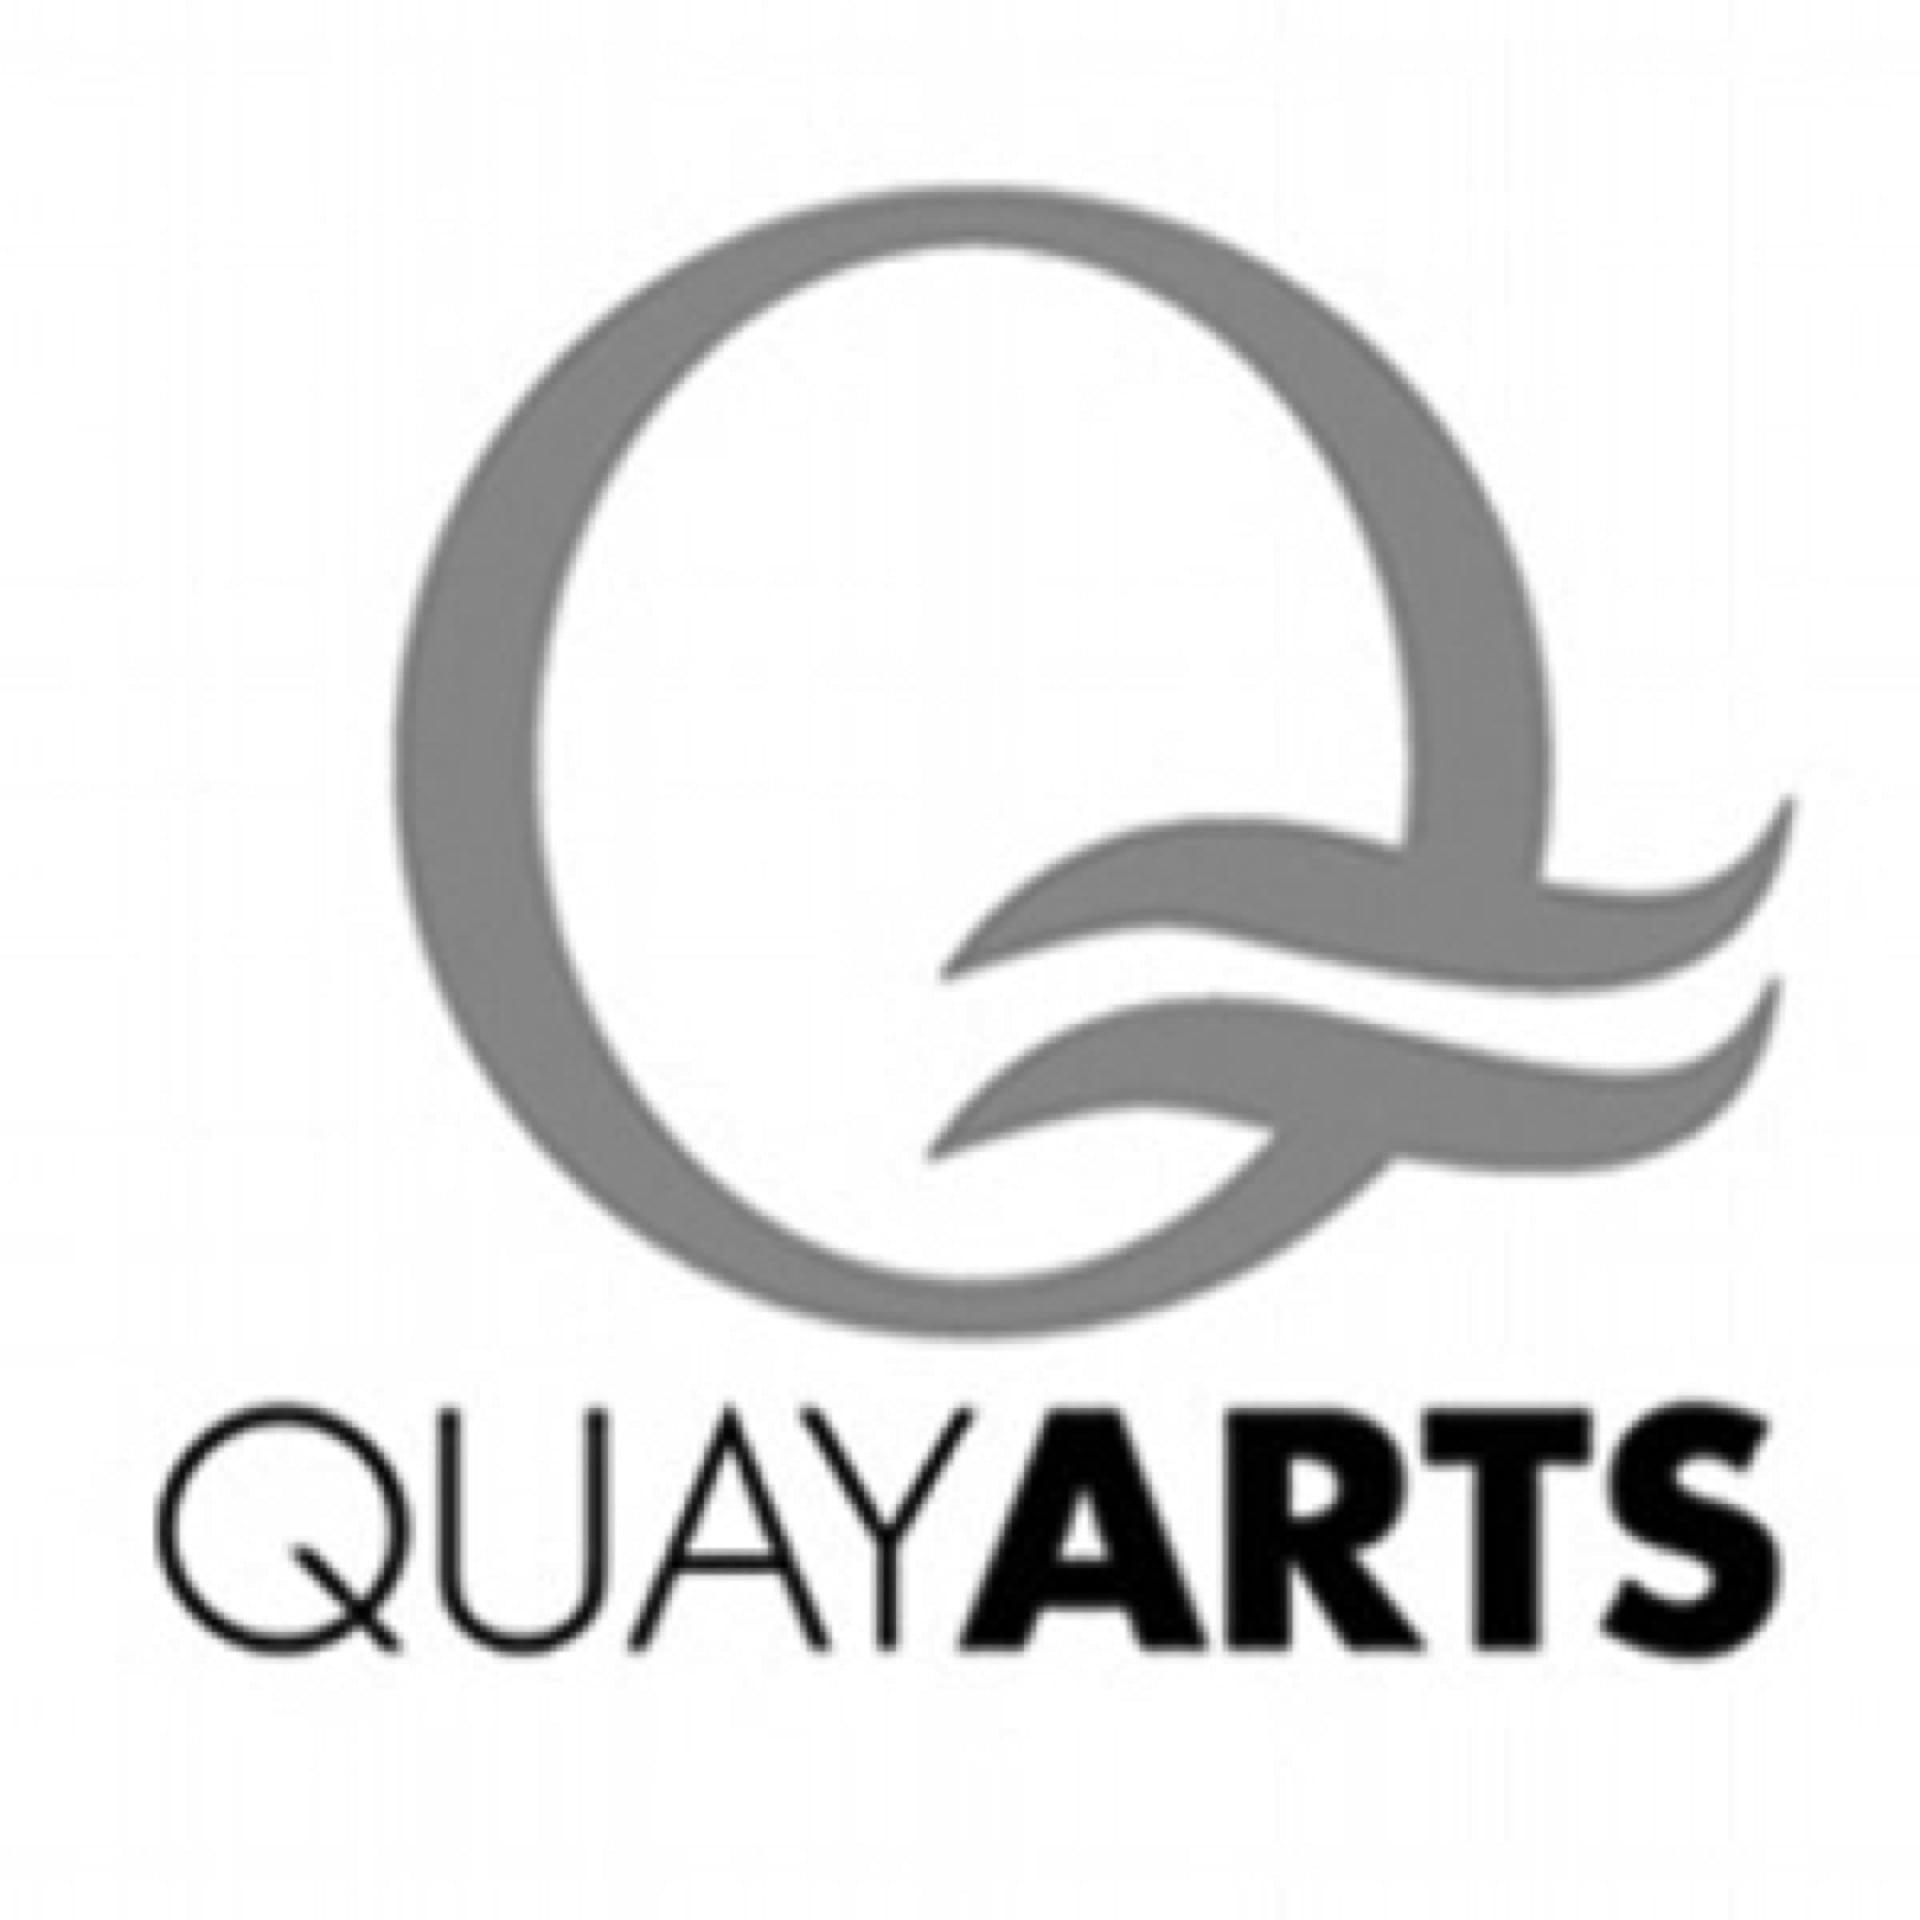 Quay Arts